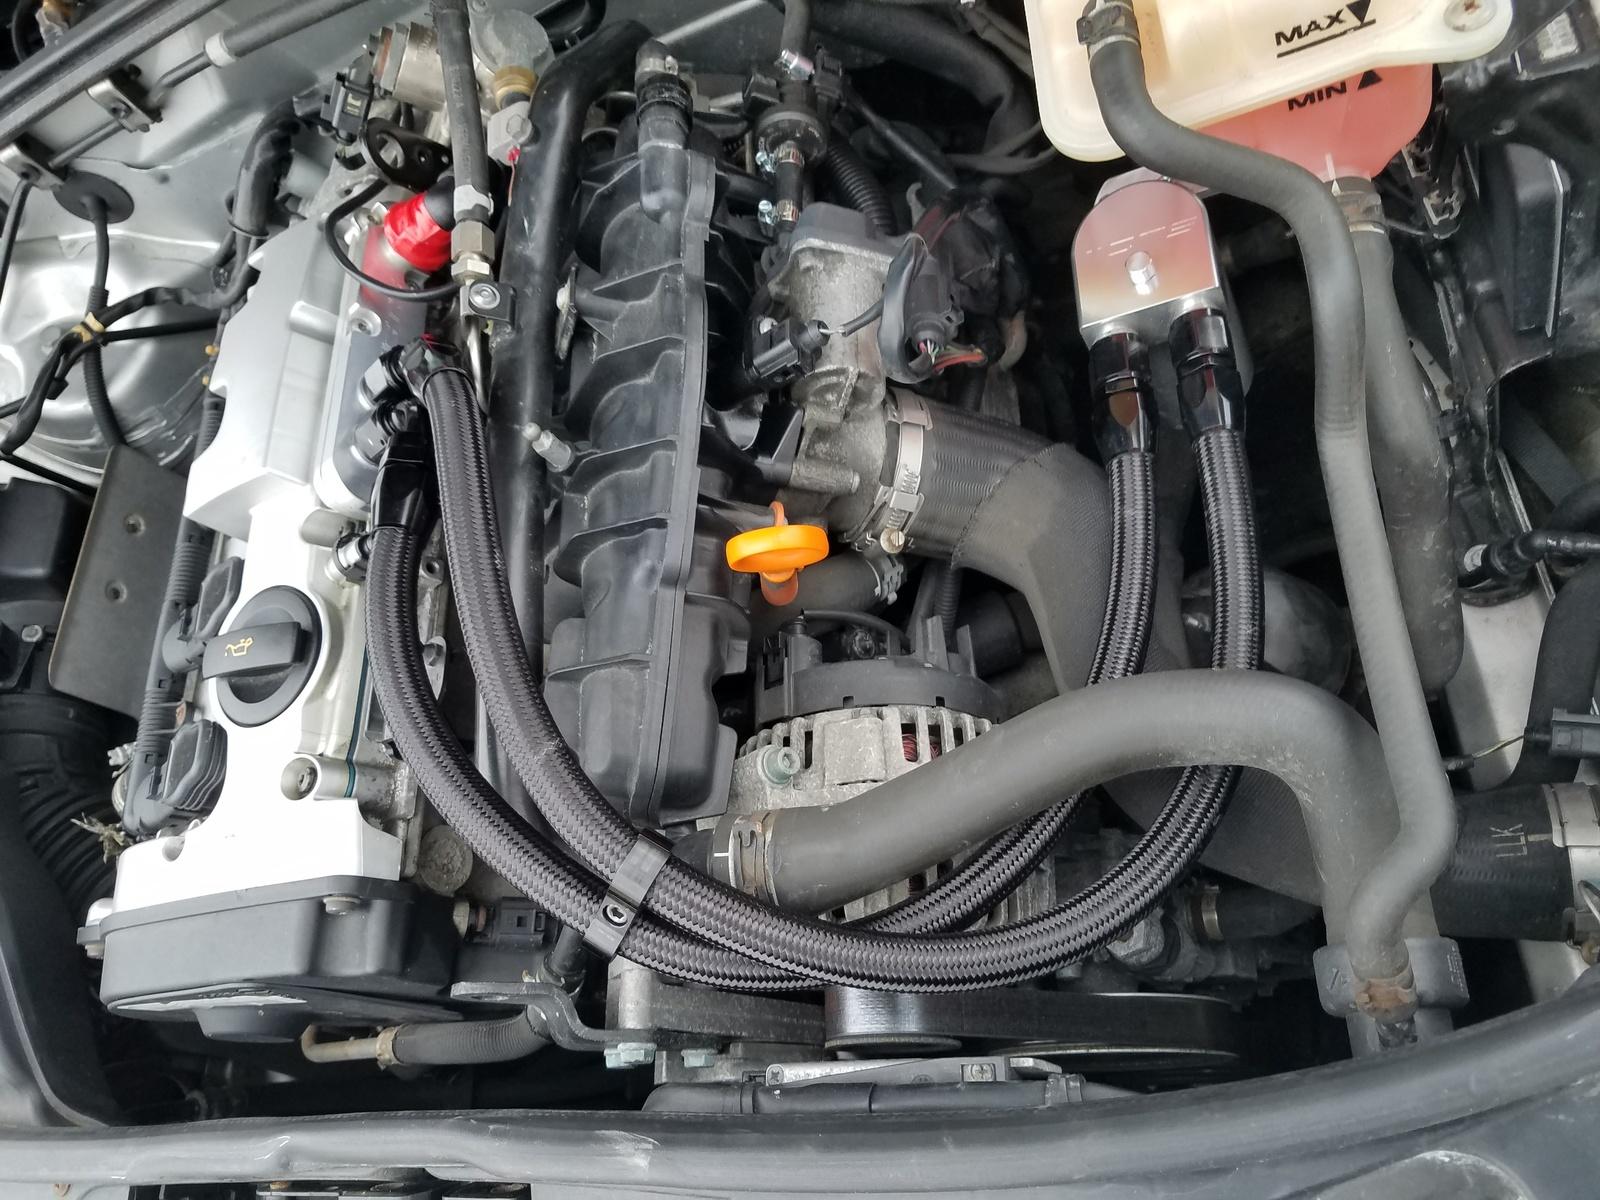 2005 Audi A4 Engine Valve Cover Diagram Car Parts Diagram